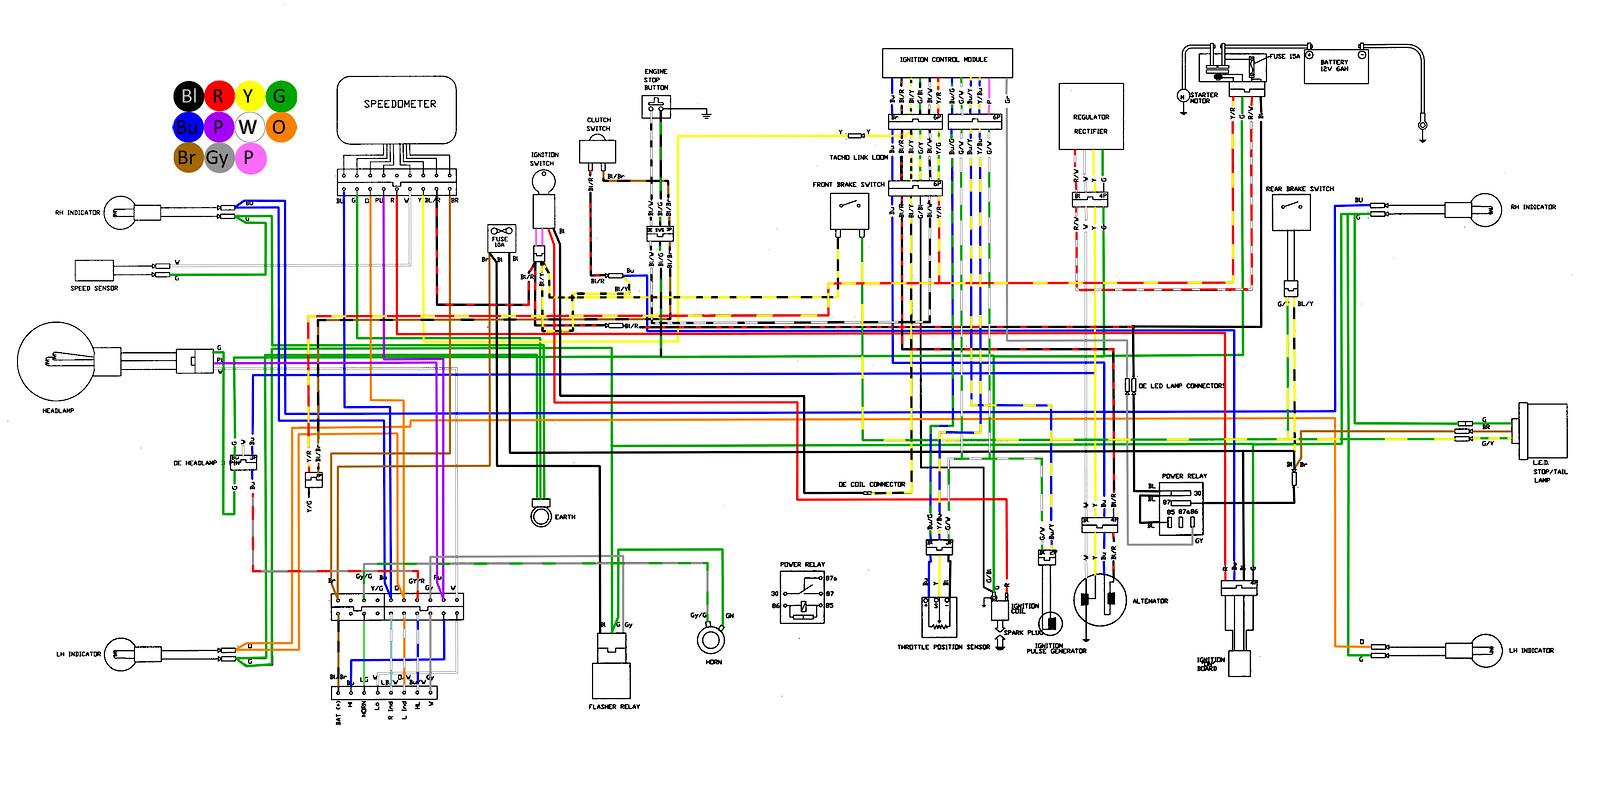 hight resolution of honda crf 150 wiring diagram simple wiring schema honda crf 150 2018 crf 150 wiring diagram